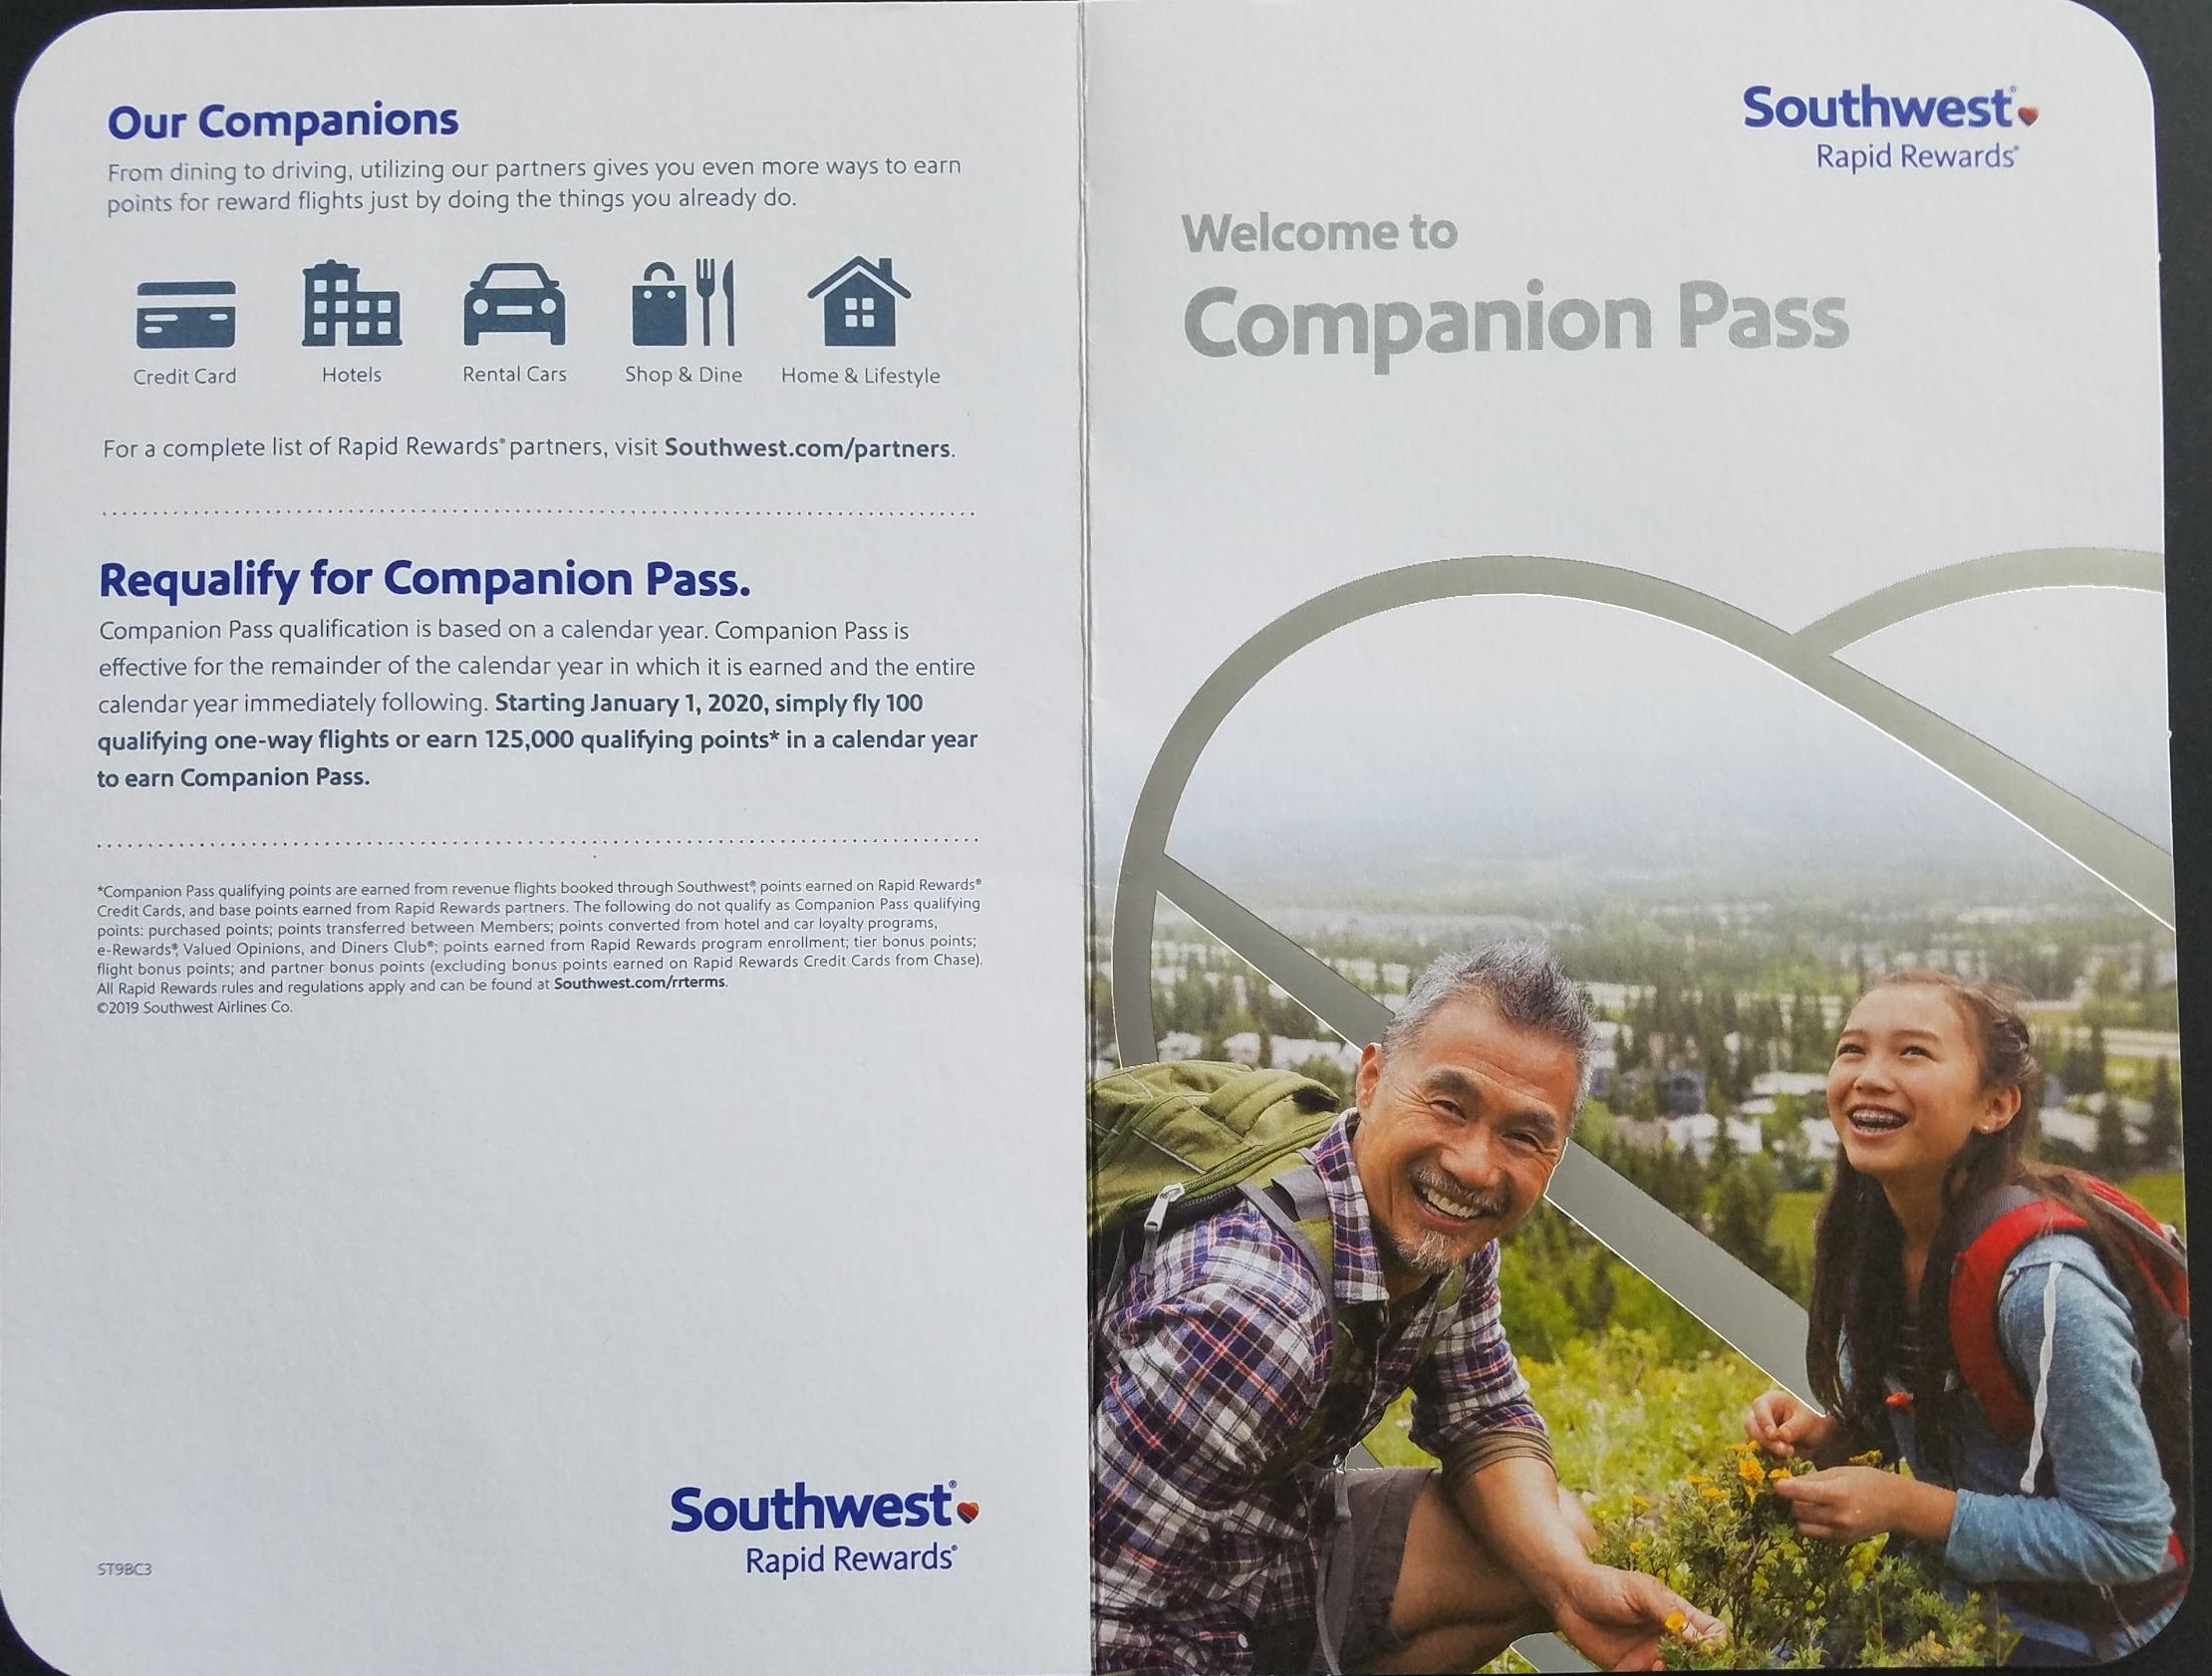 http://server.digimetriq.com/wp-content/uploads/2021/02/Southwest-Has-A-Credit-Card-Offer-That-Comes-With-Companion.jpg